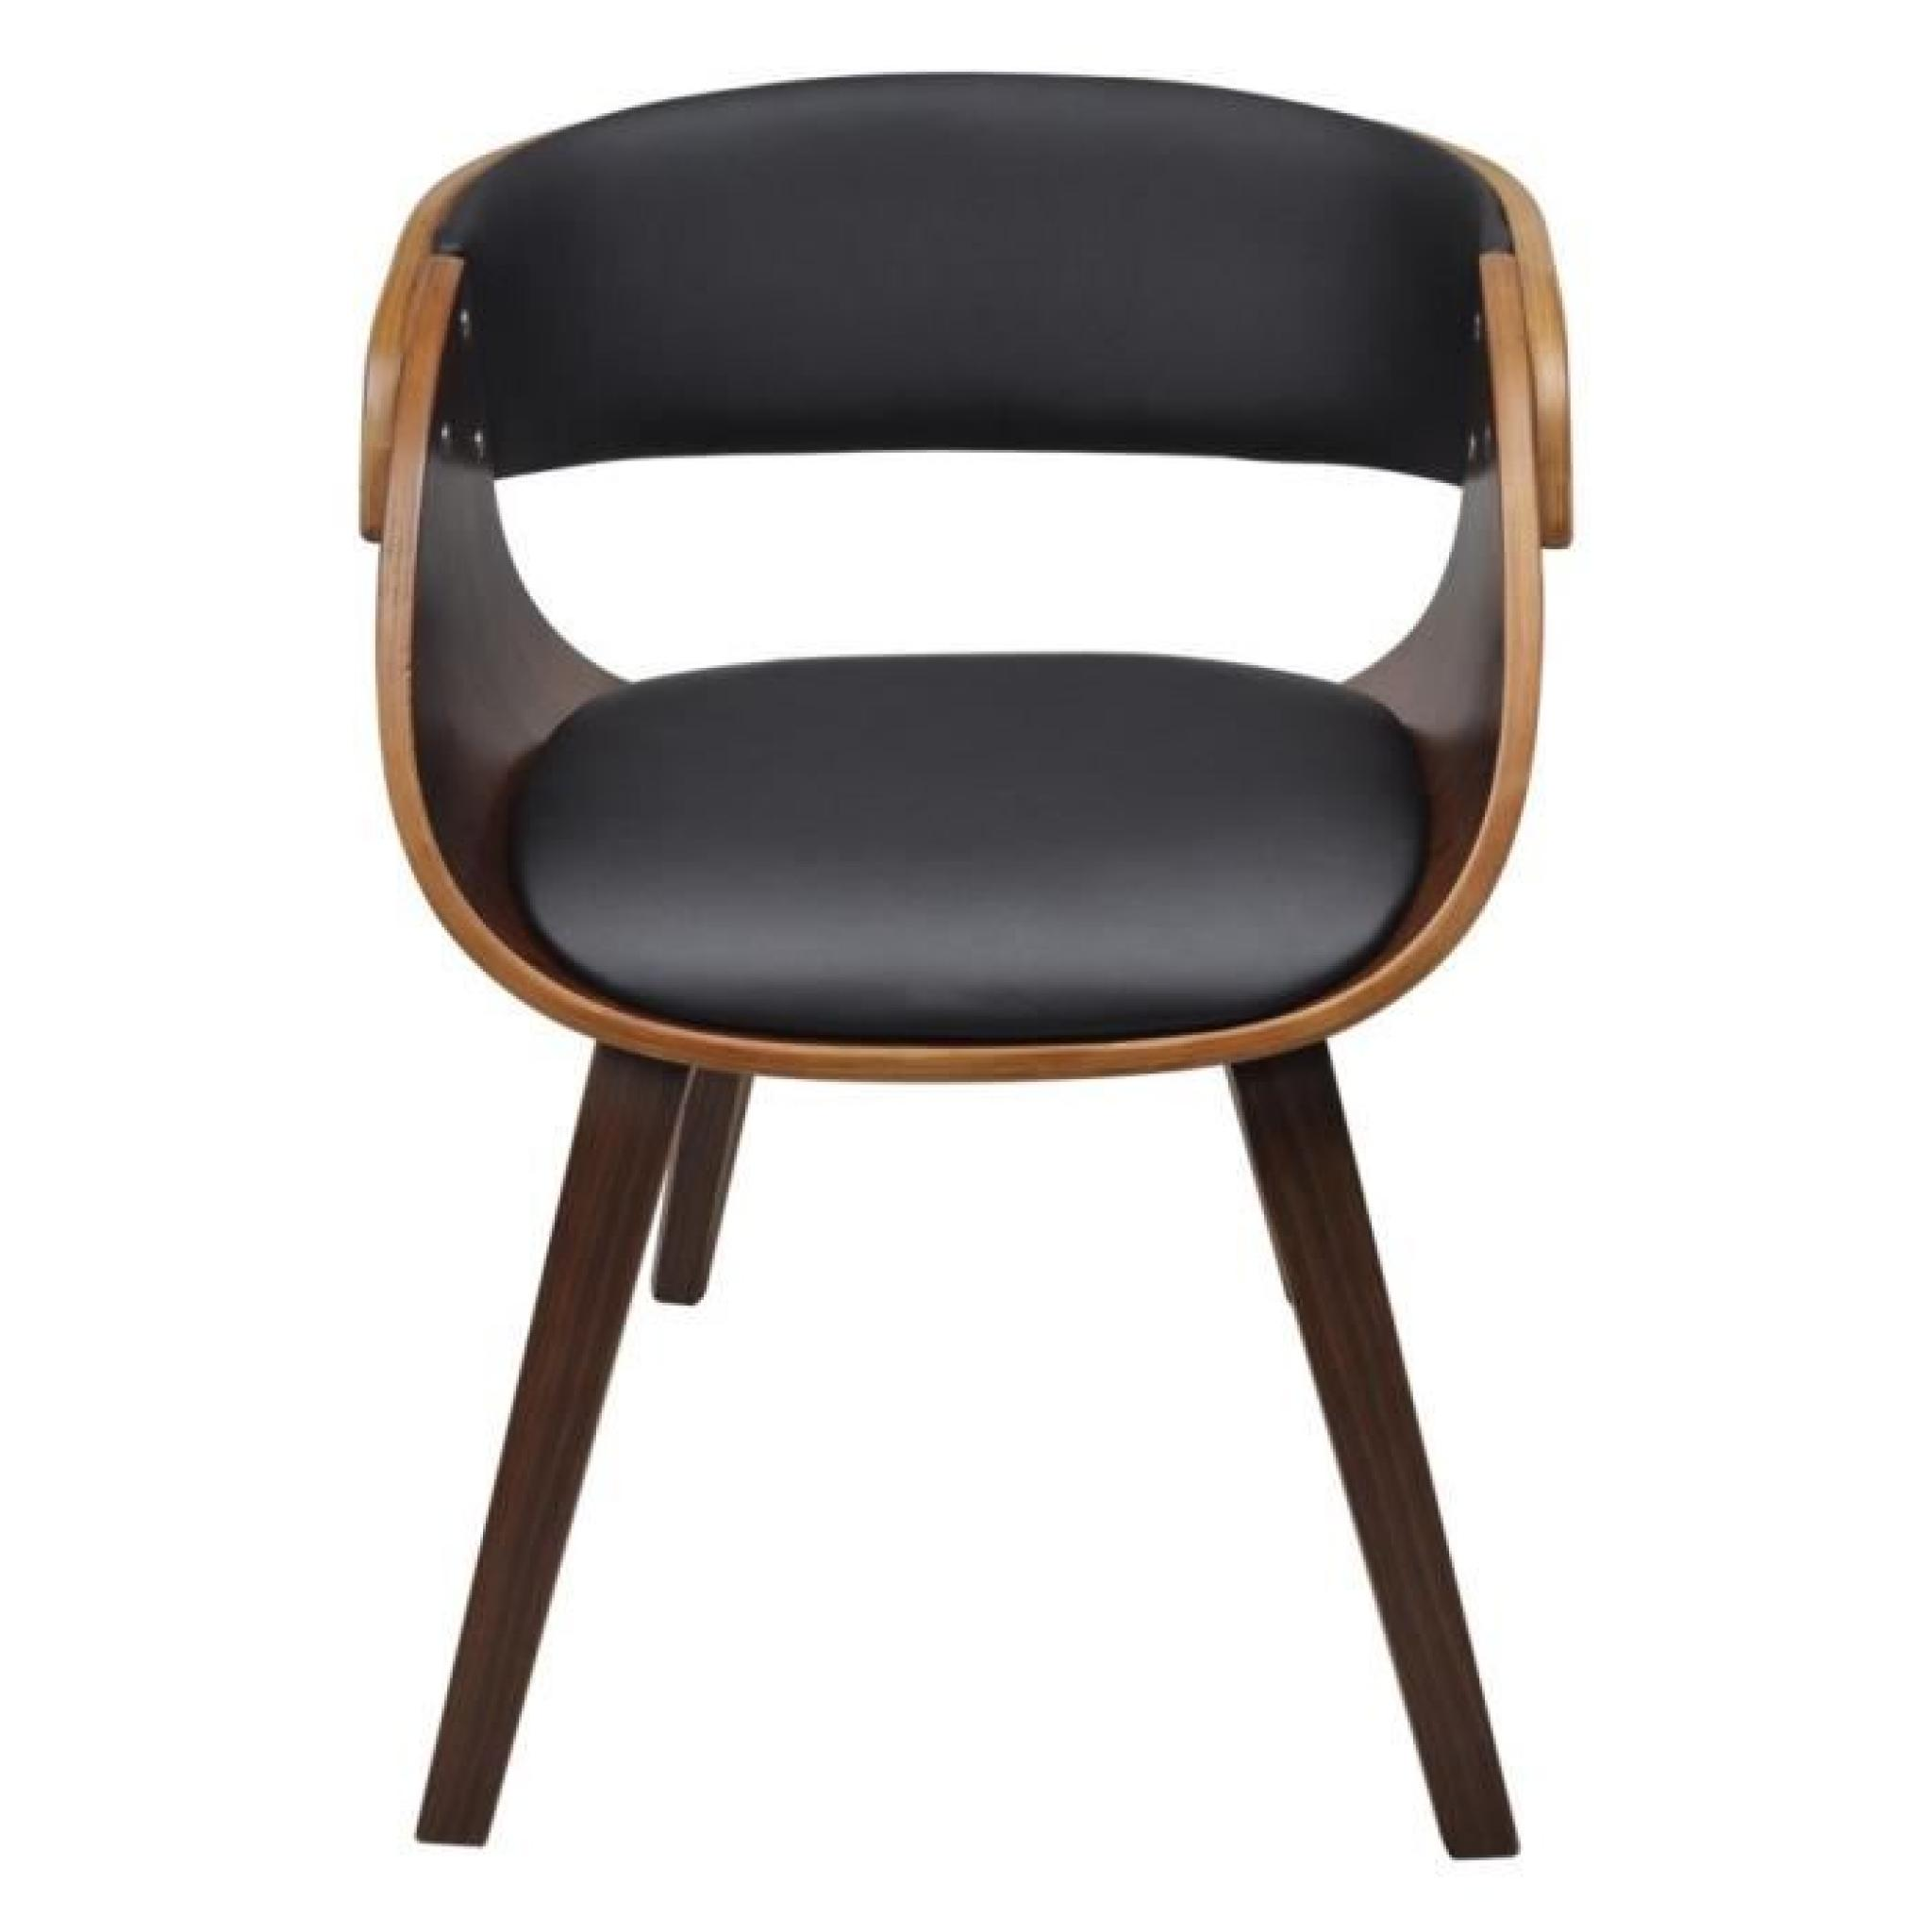 Magnifique chaise a accoudoirs salle a manger brun achat for Chaise salle a manger couleur